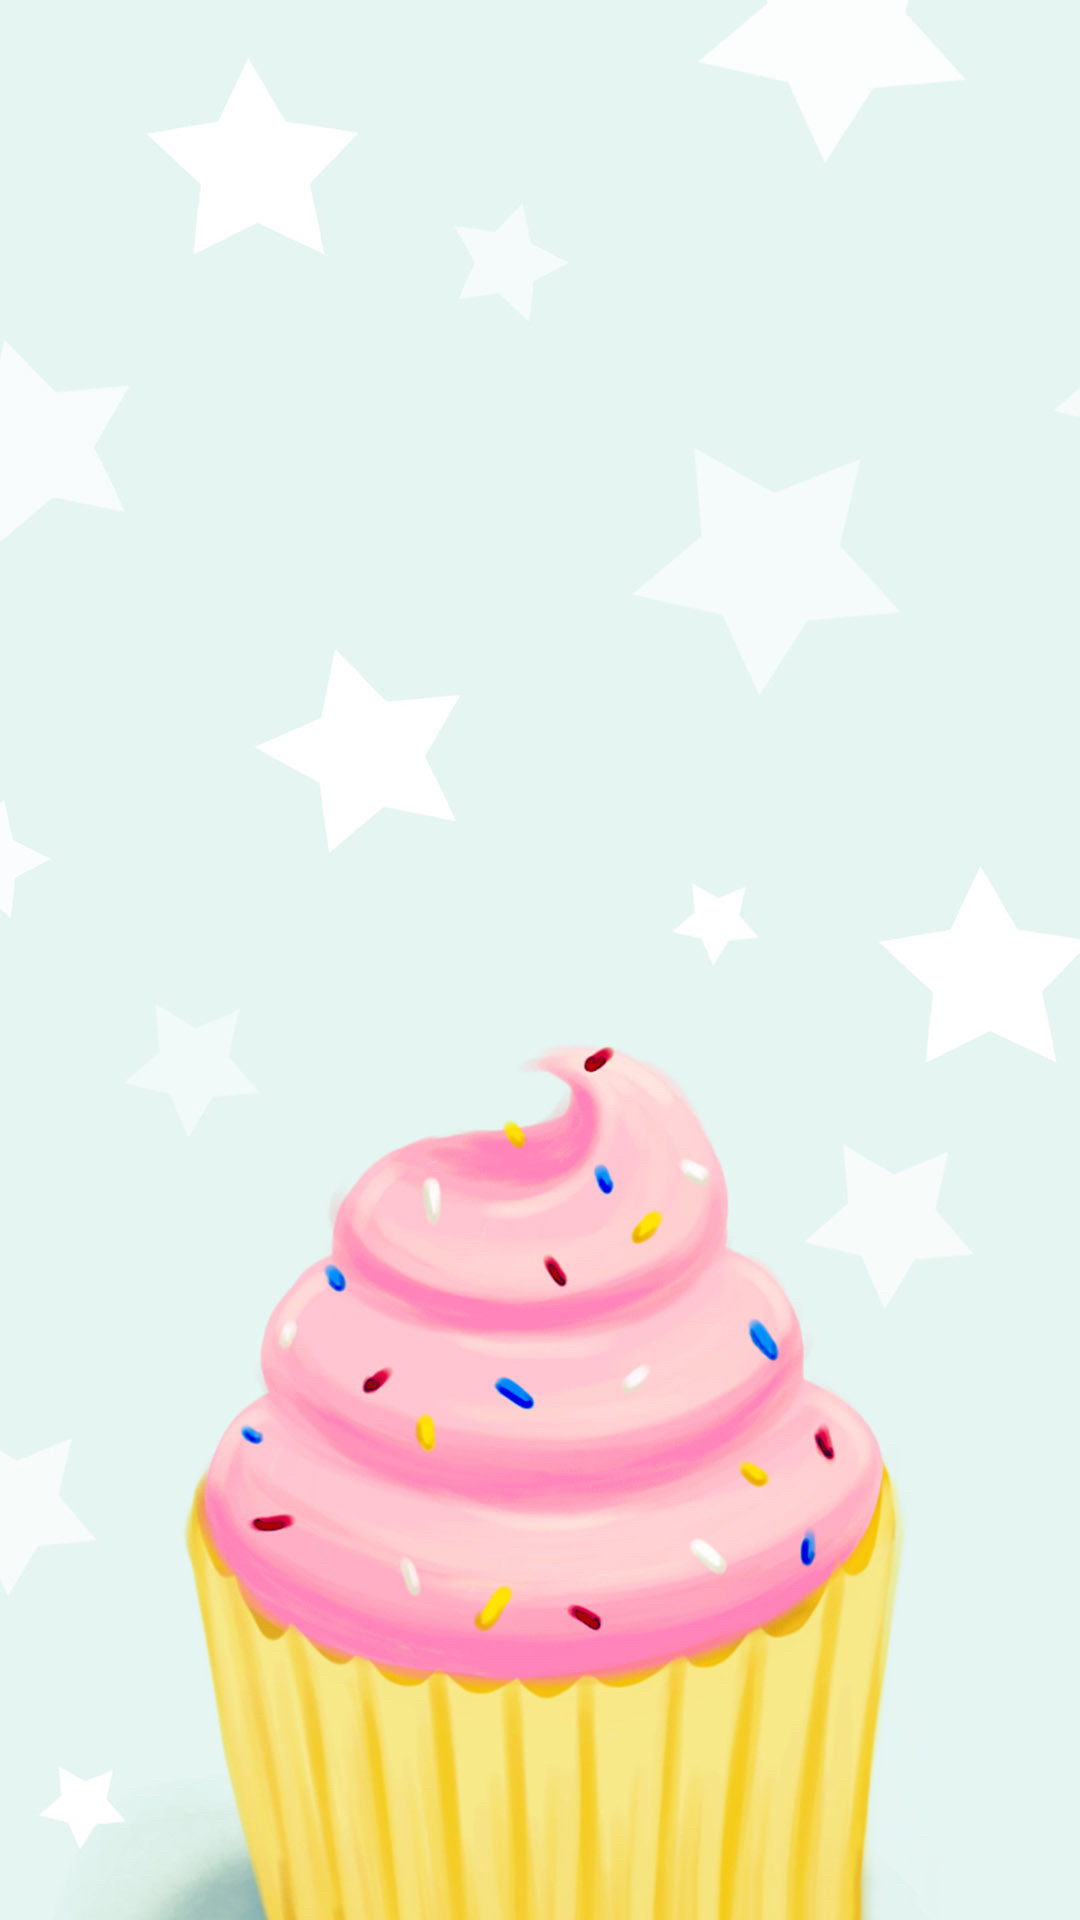 Kawaii Cupcake Wallpaper 50 images